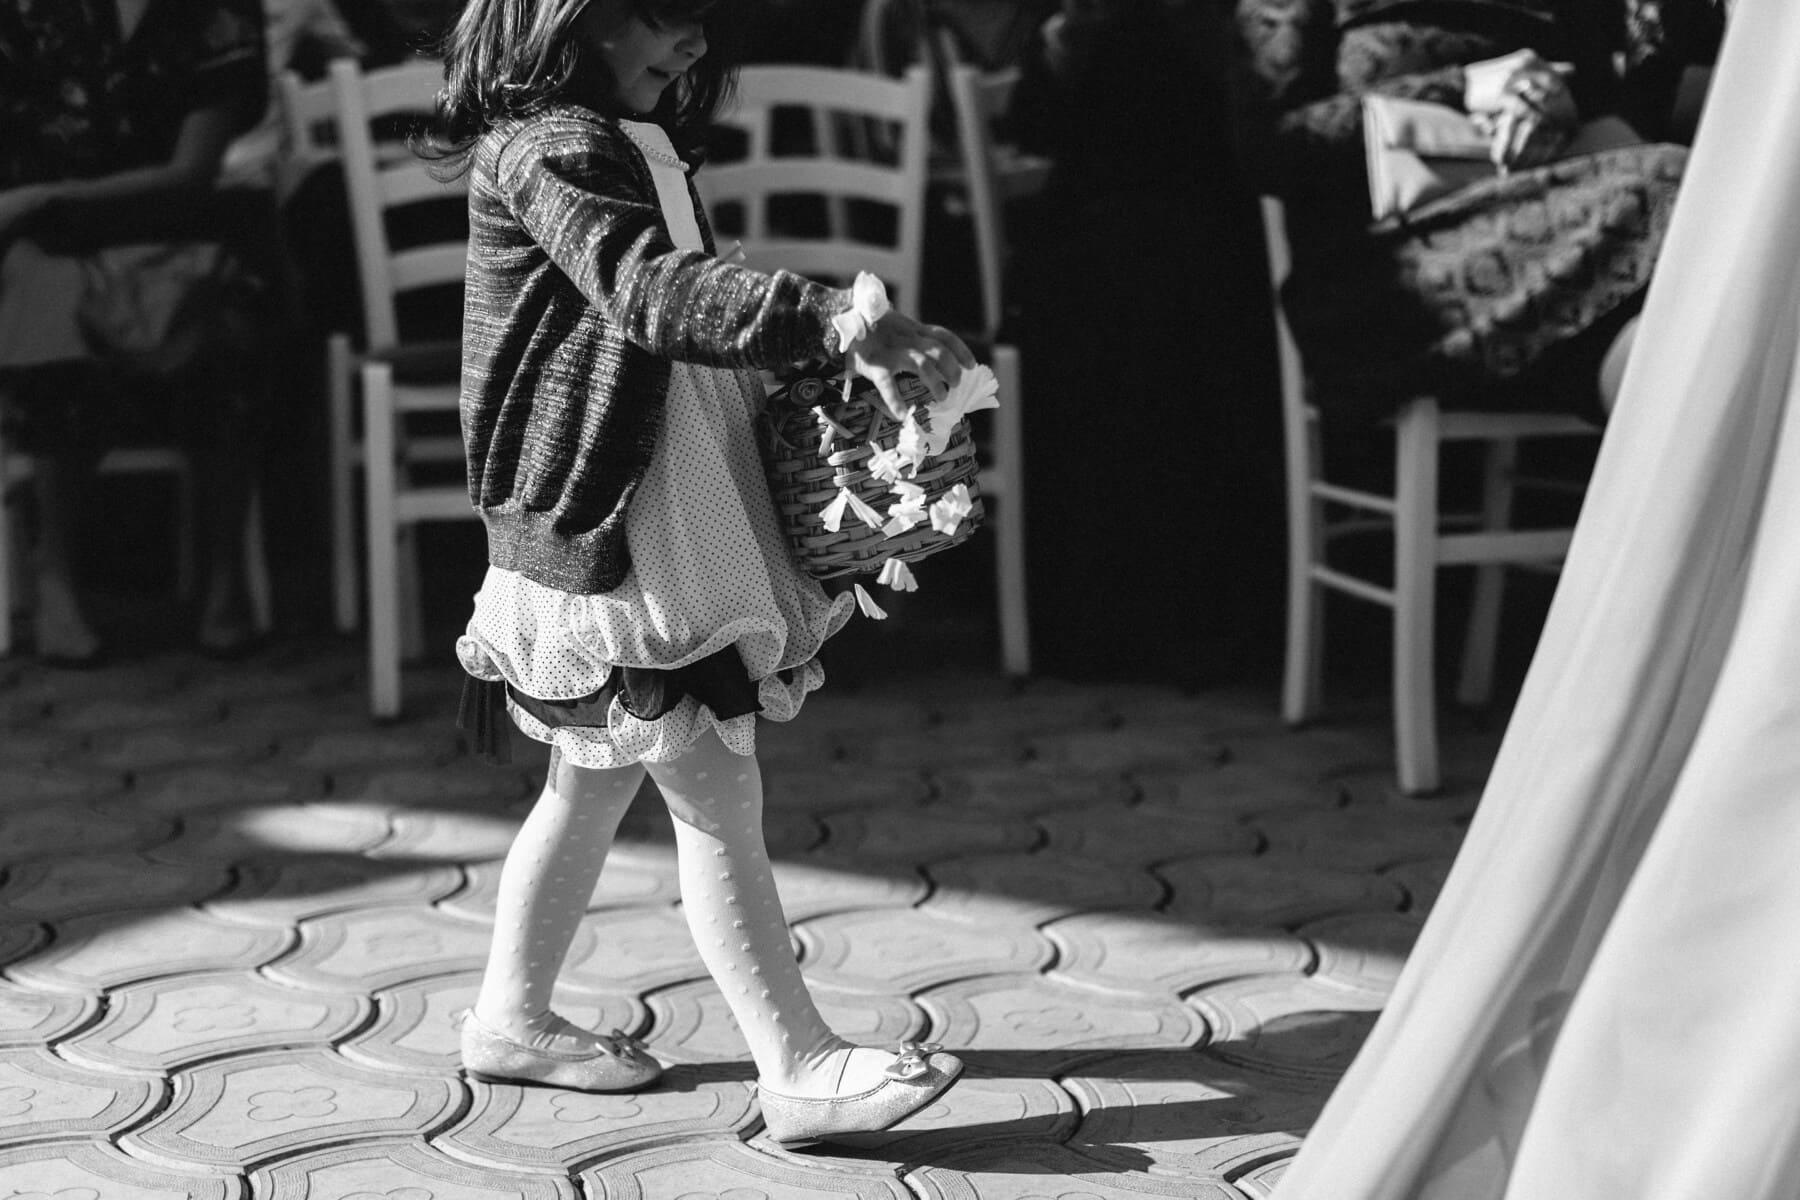 celebration, event, black and white, child, wicker basket, street, people, monochrome, woman, portrait